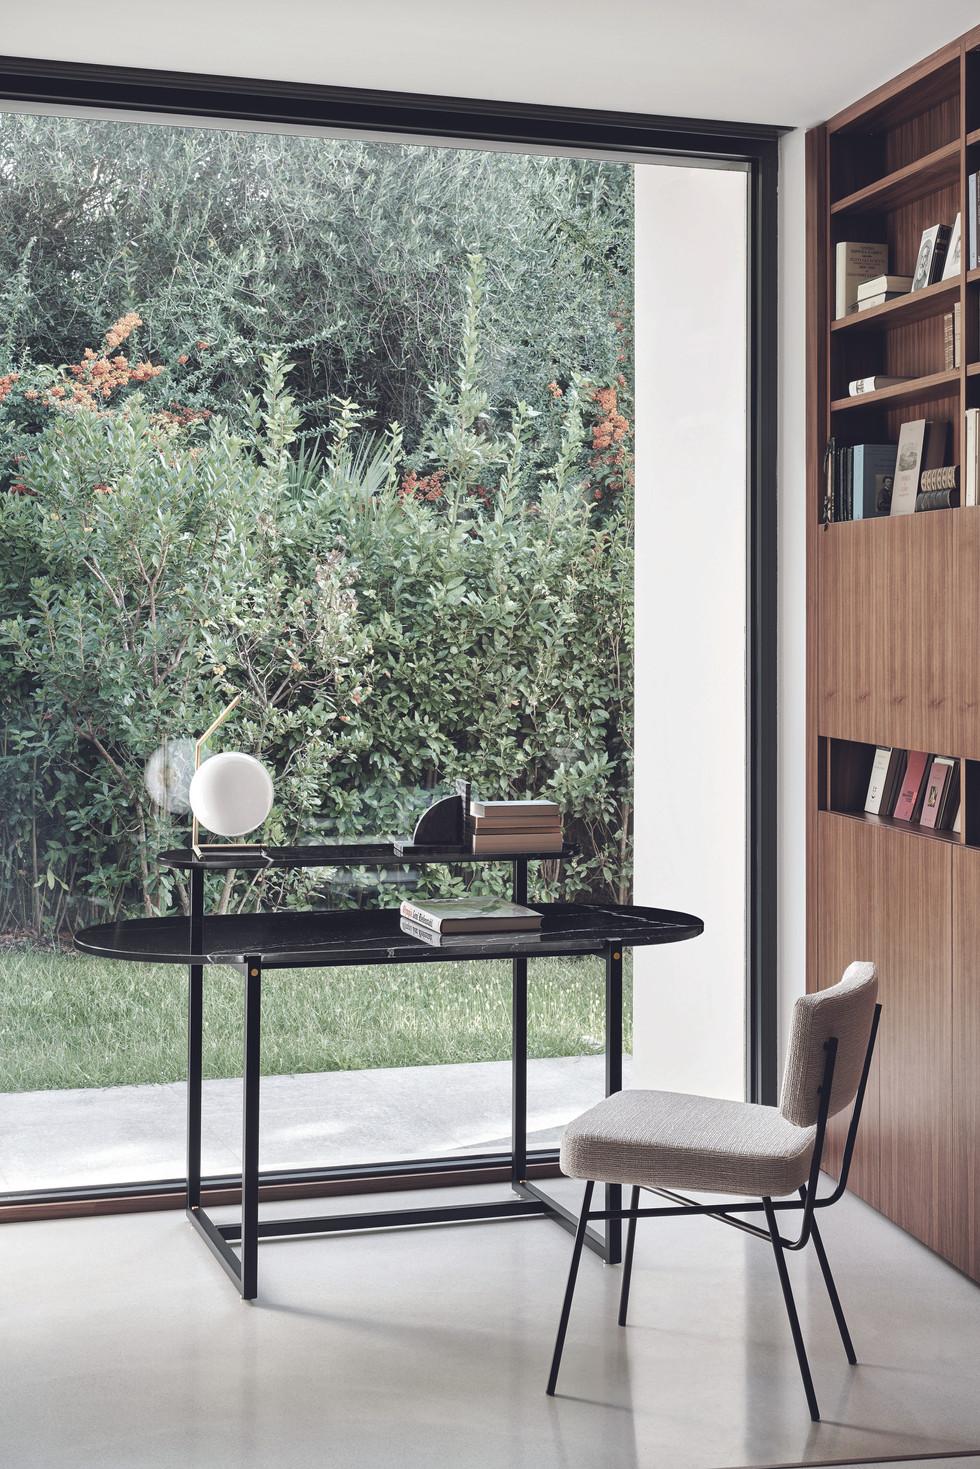 arflex-elettra-chair-design-bbpr_am